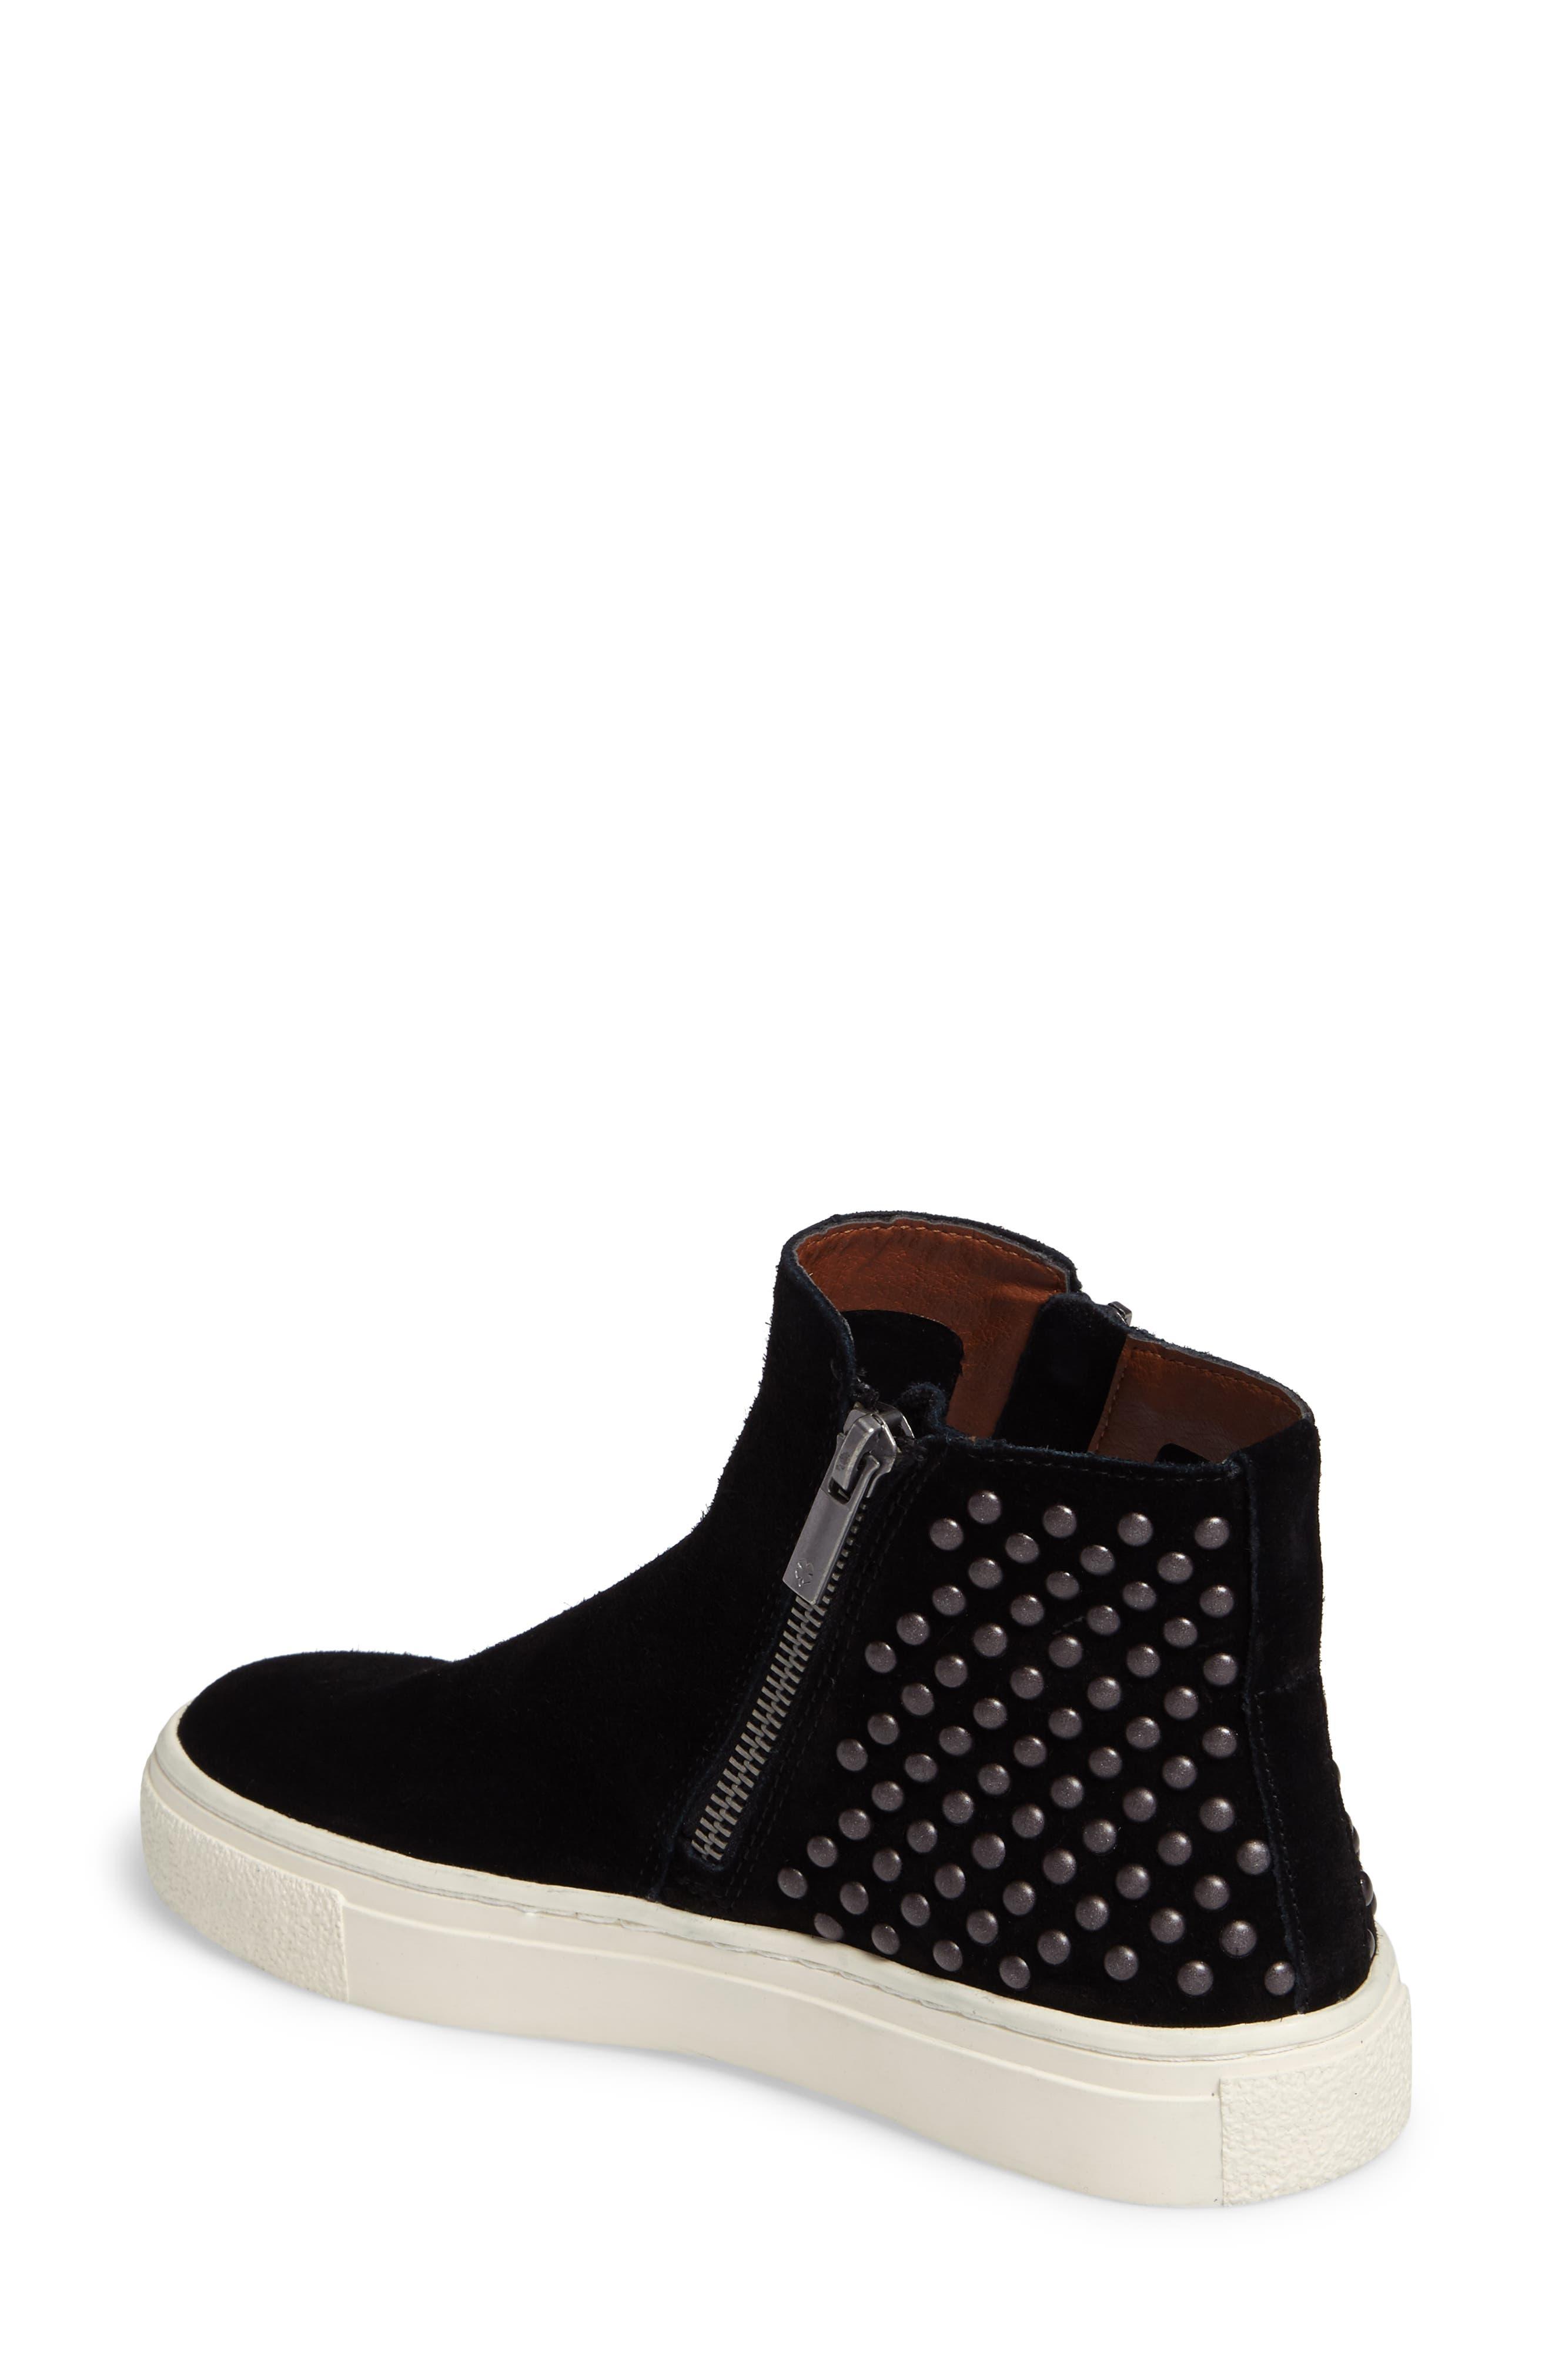 Bayleah High Top Sneaker,                             Alternate thumbnail 2, color,                             Black Suede